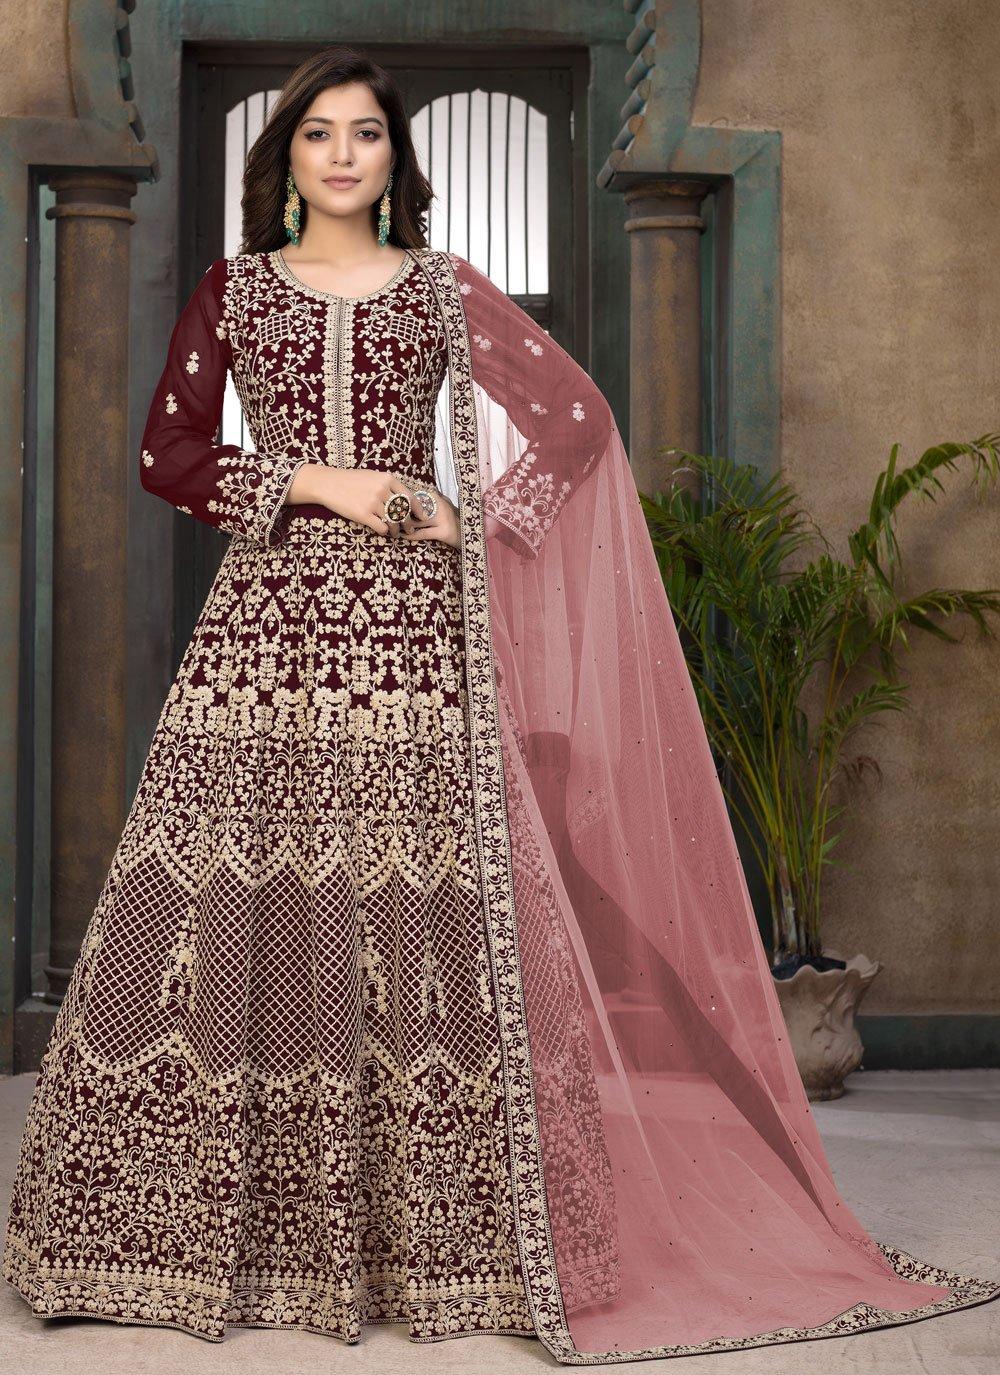 Embroidered Faux Georgette Floor Length Anarkali Suit in Maroon